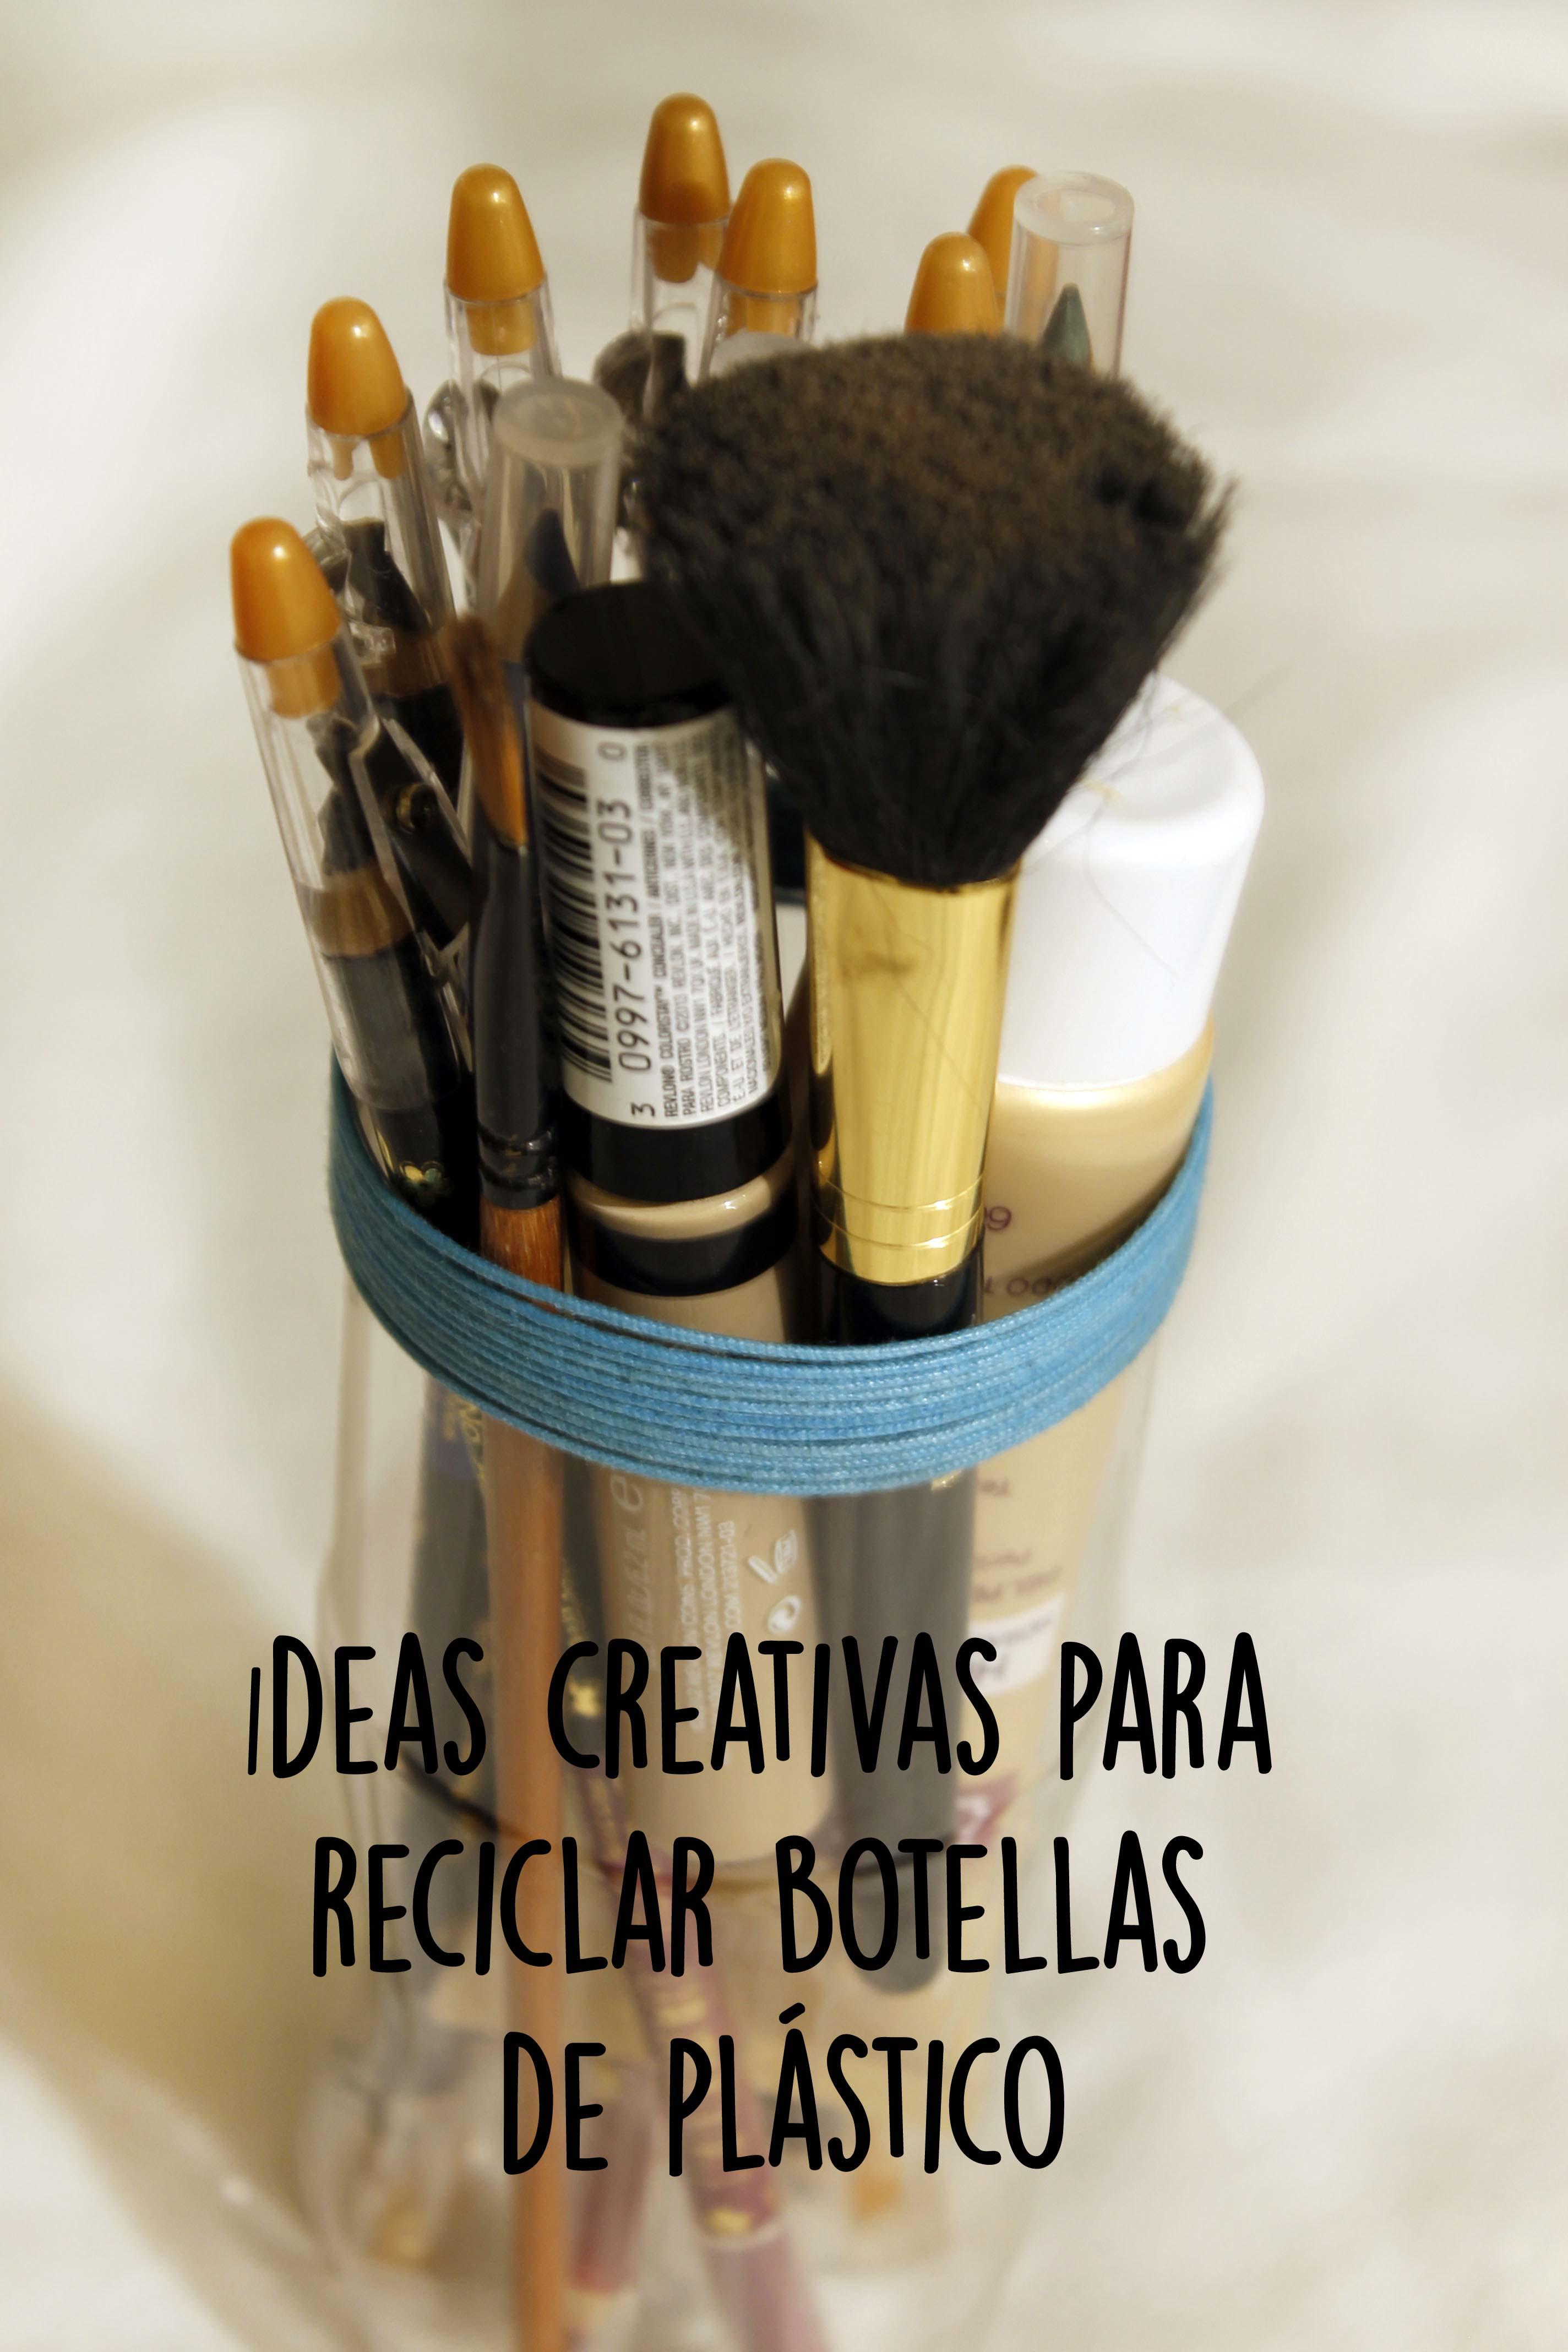 Read more about the article Ideas creativas para reciclar botellas de plástico